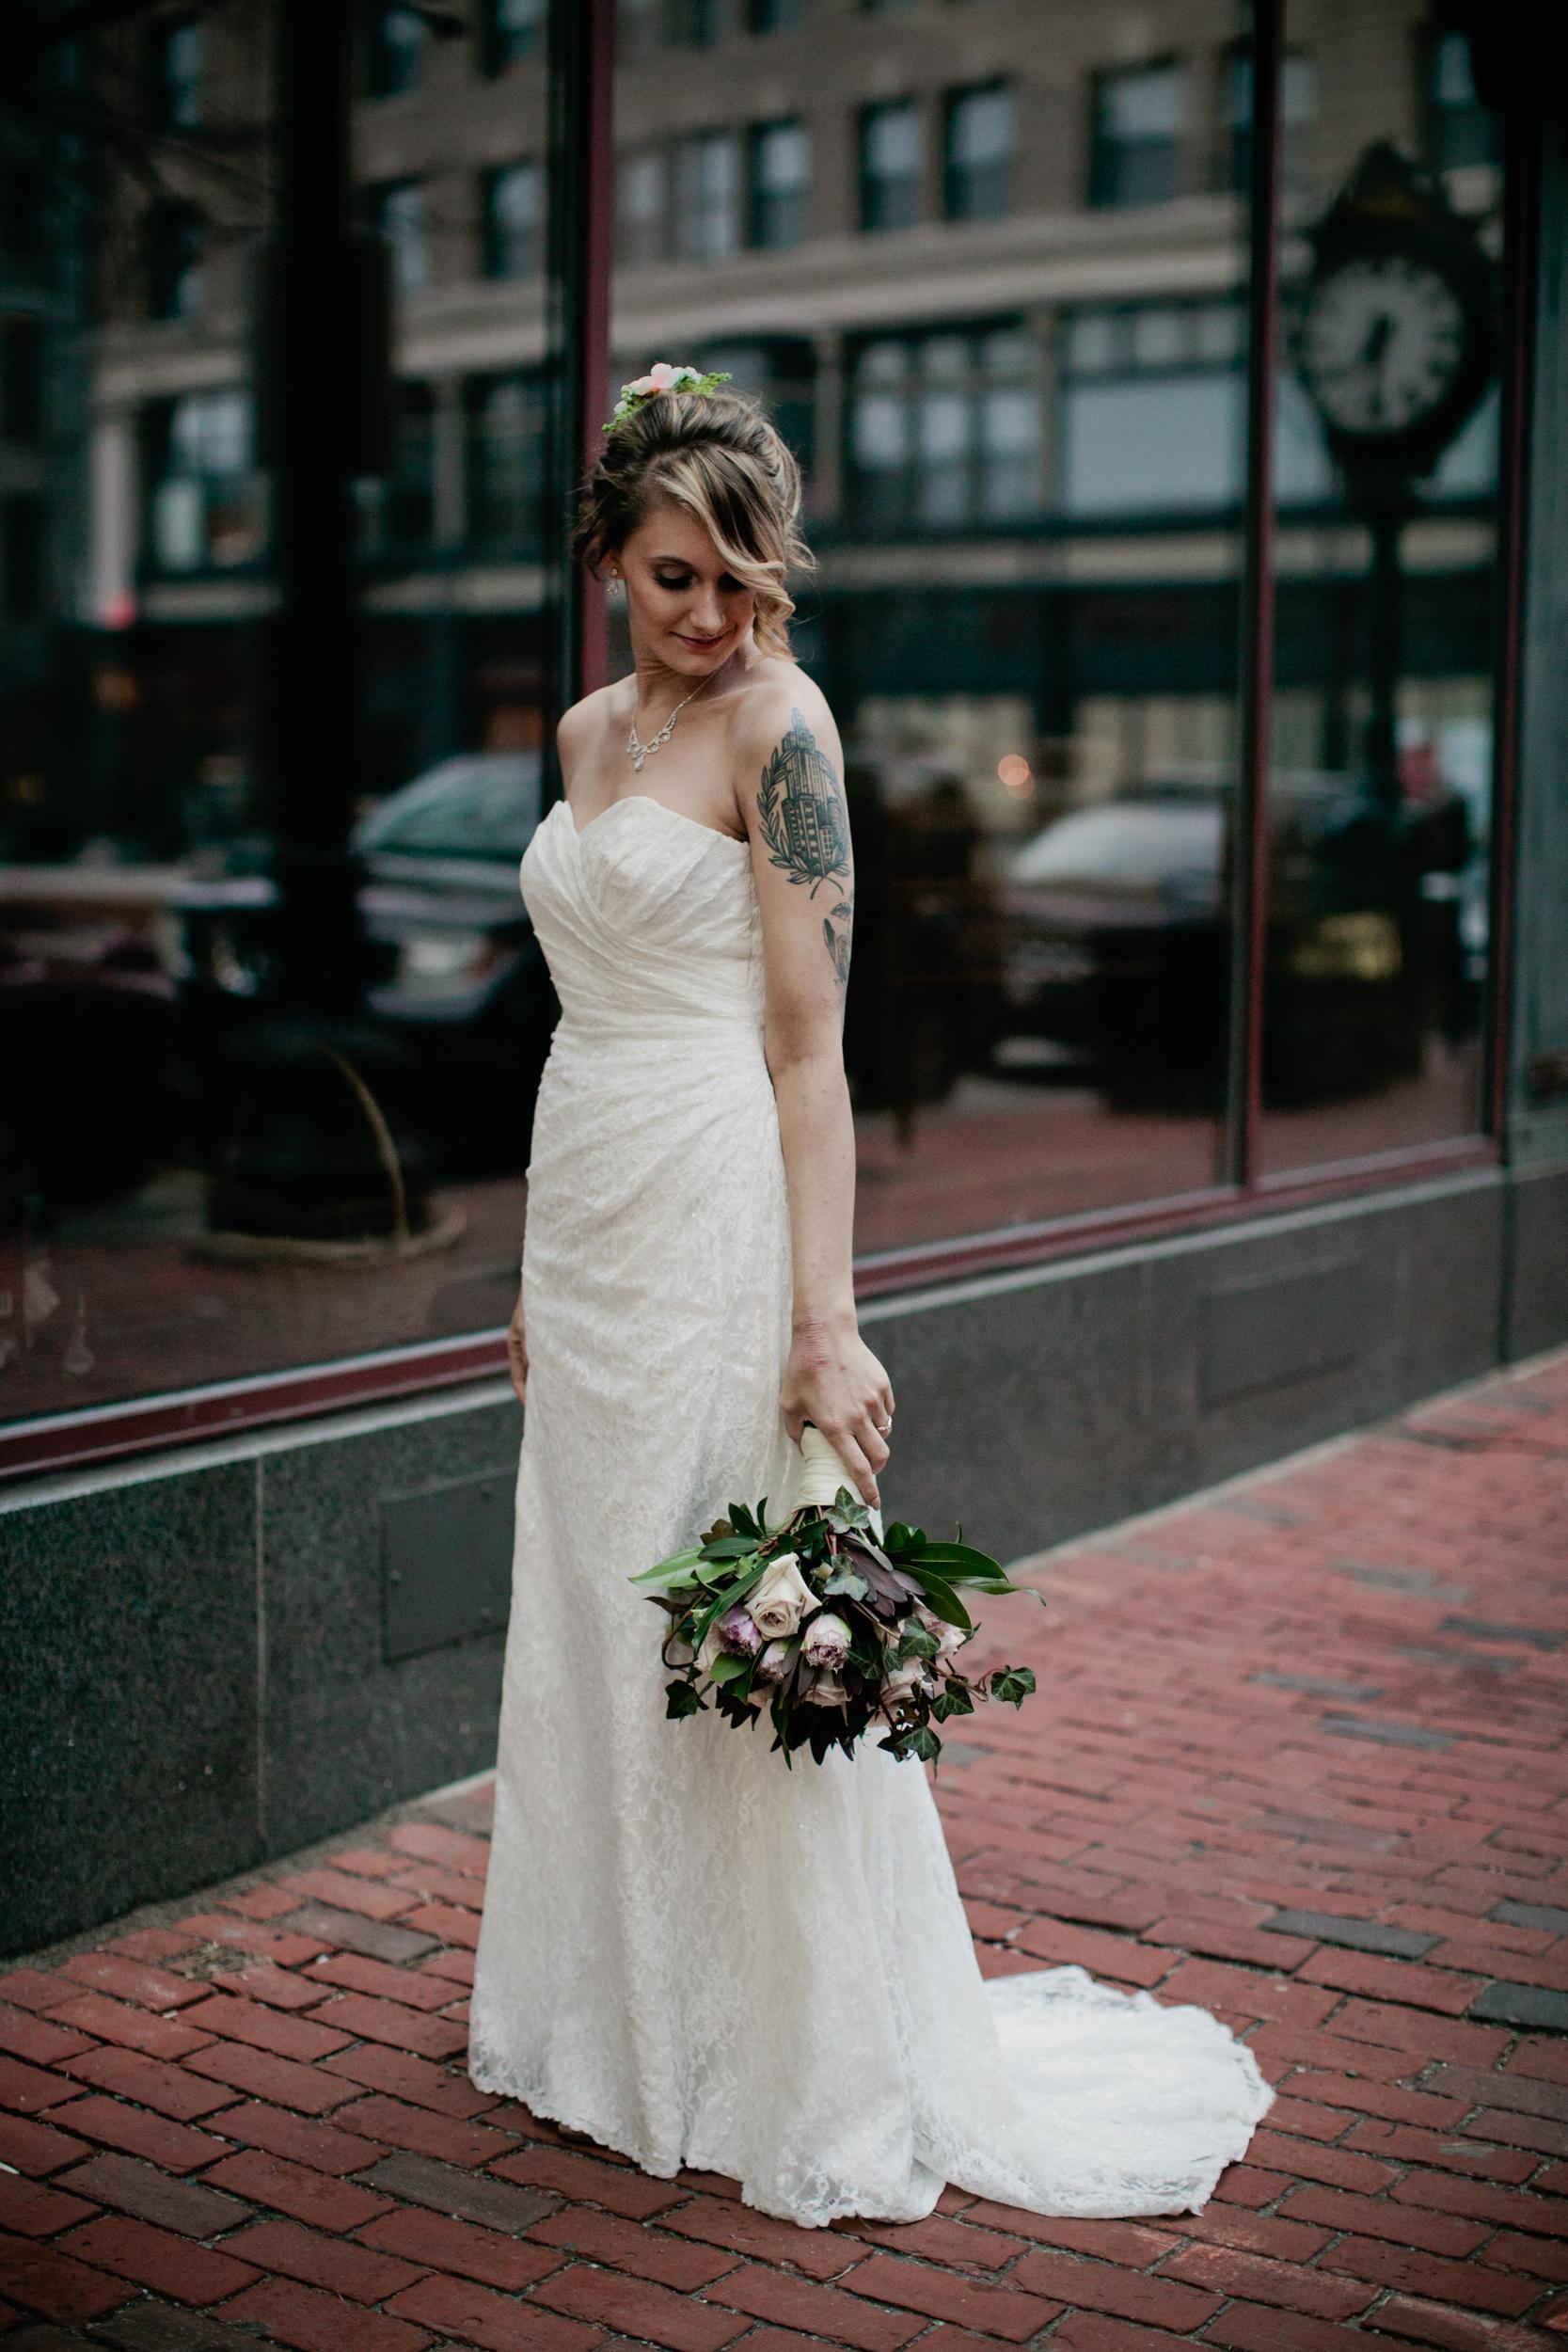 providence-wedding-photographer-107.jpg